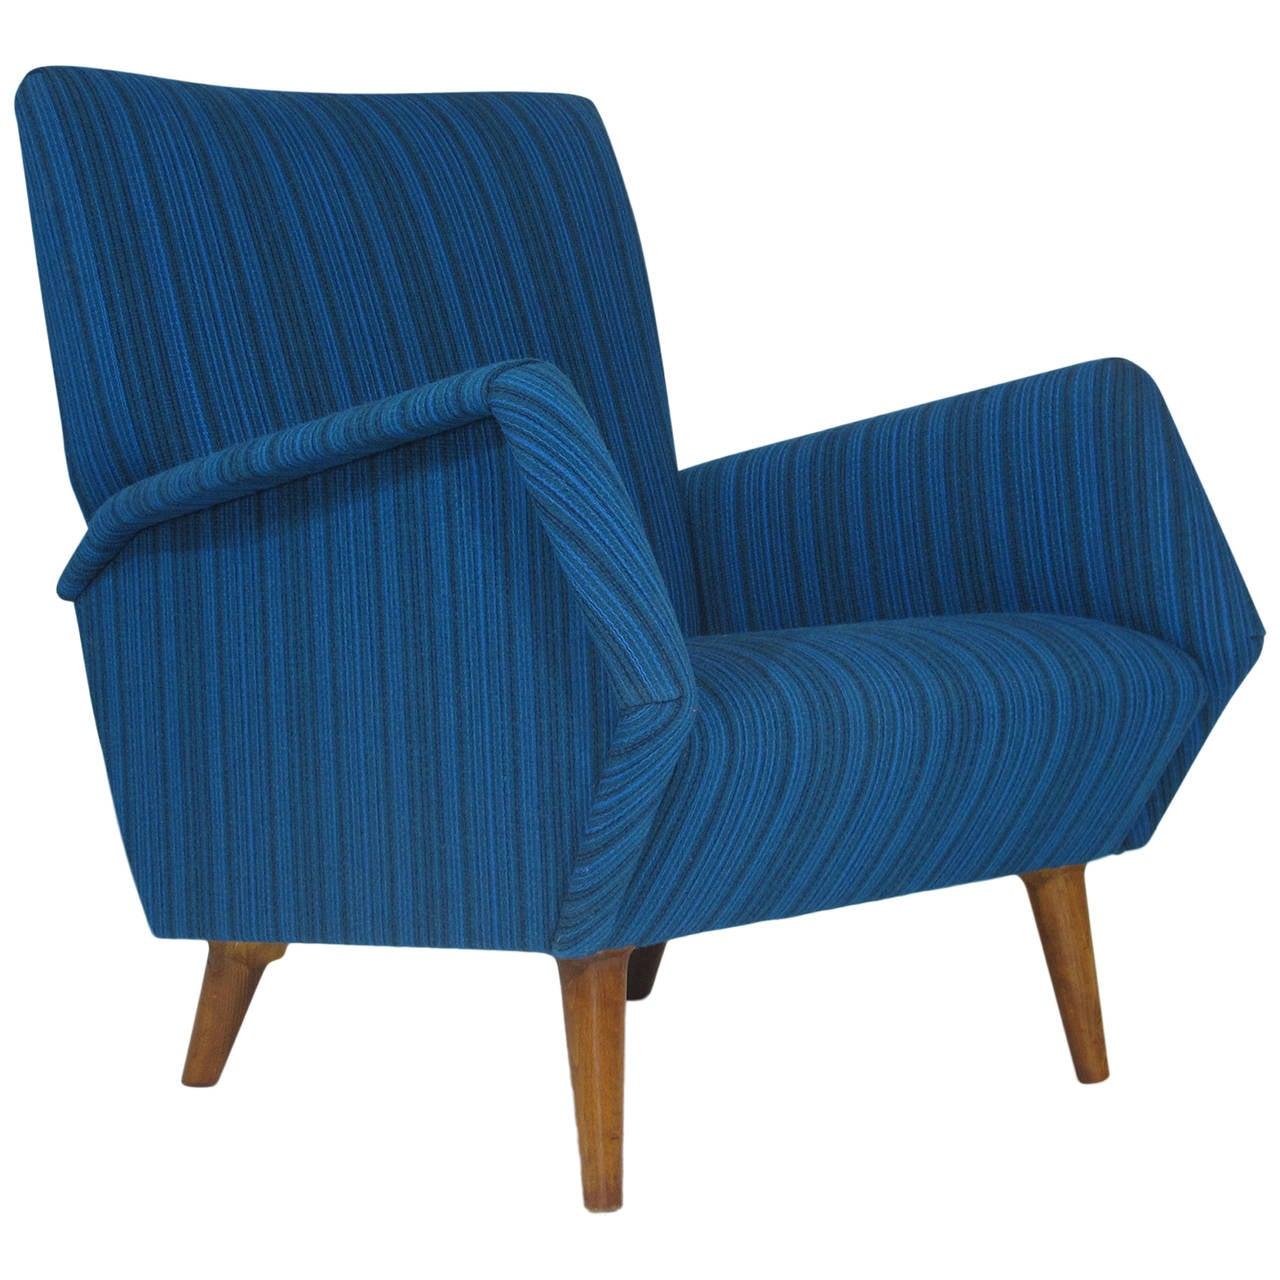 Gio Ponti Model 803 Mid-Century Italian Lounge Chair For Sale